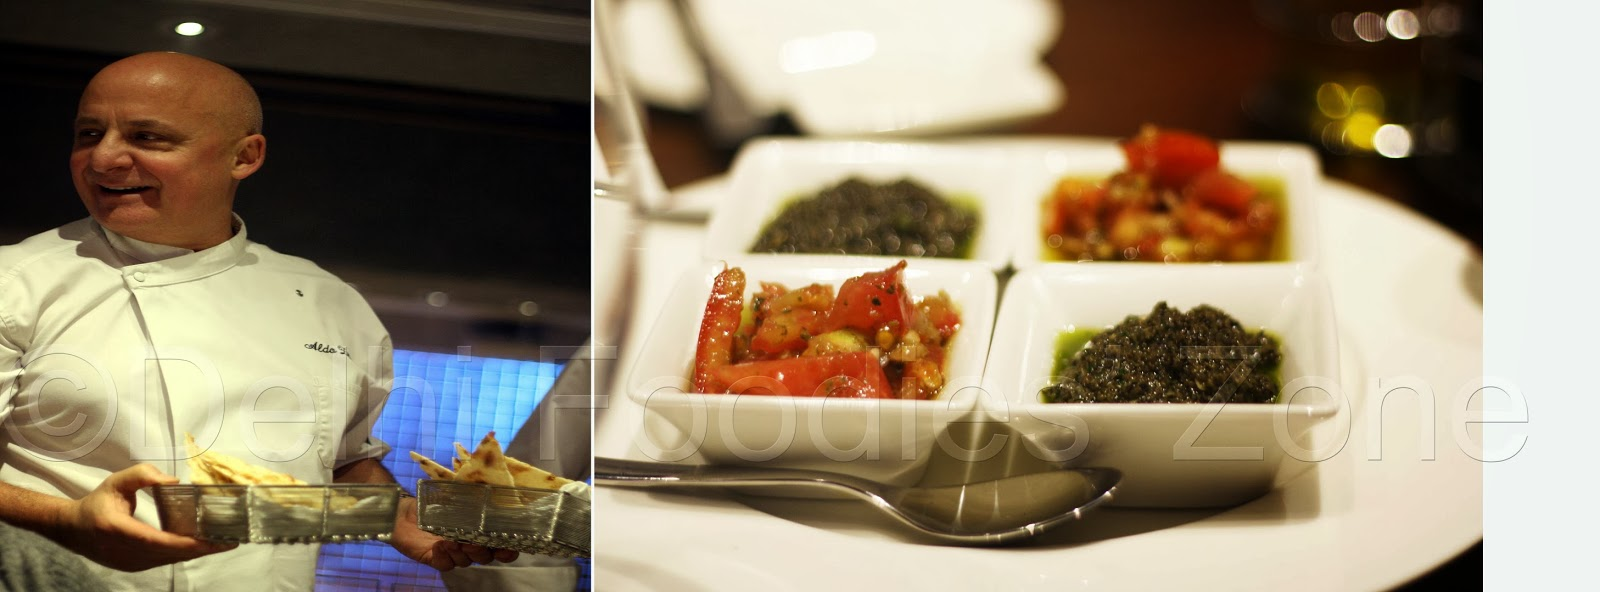 Delhi foodies 39 zone december 2013 for Cuisine new zone